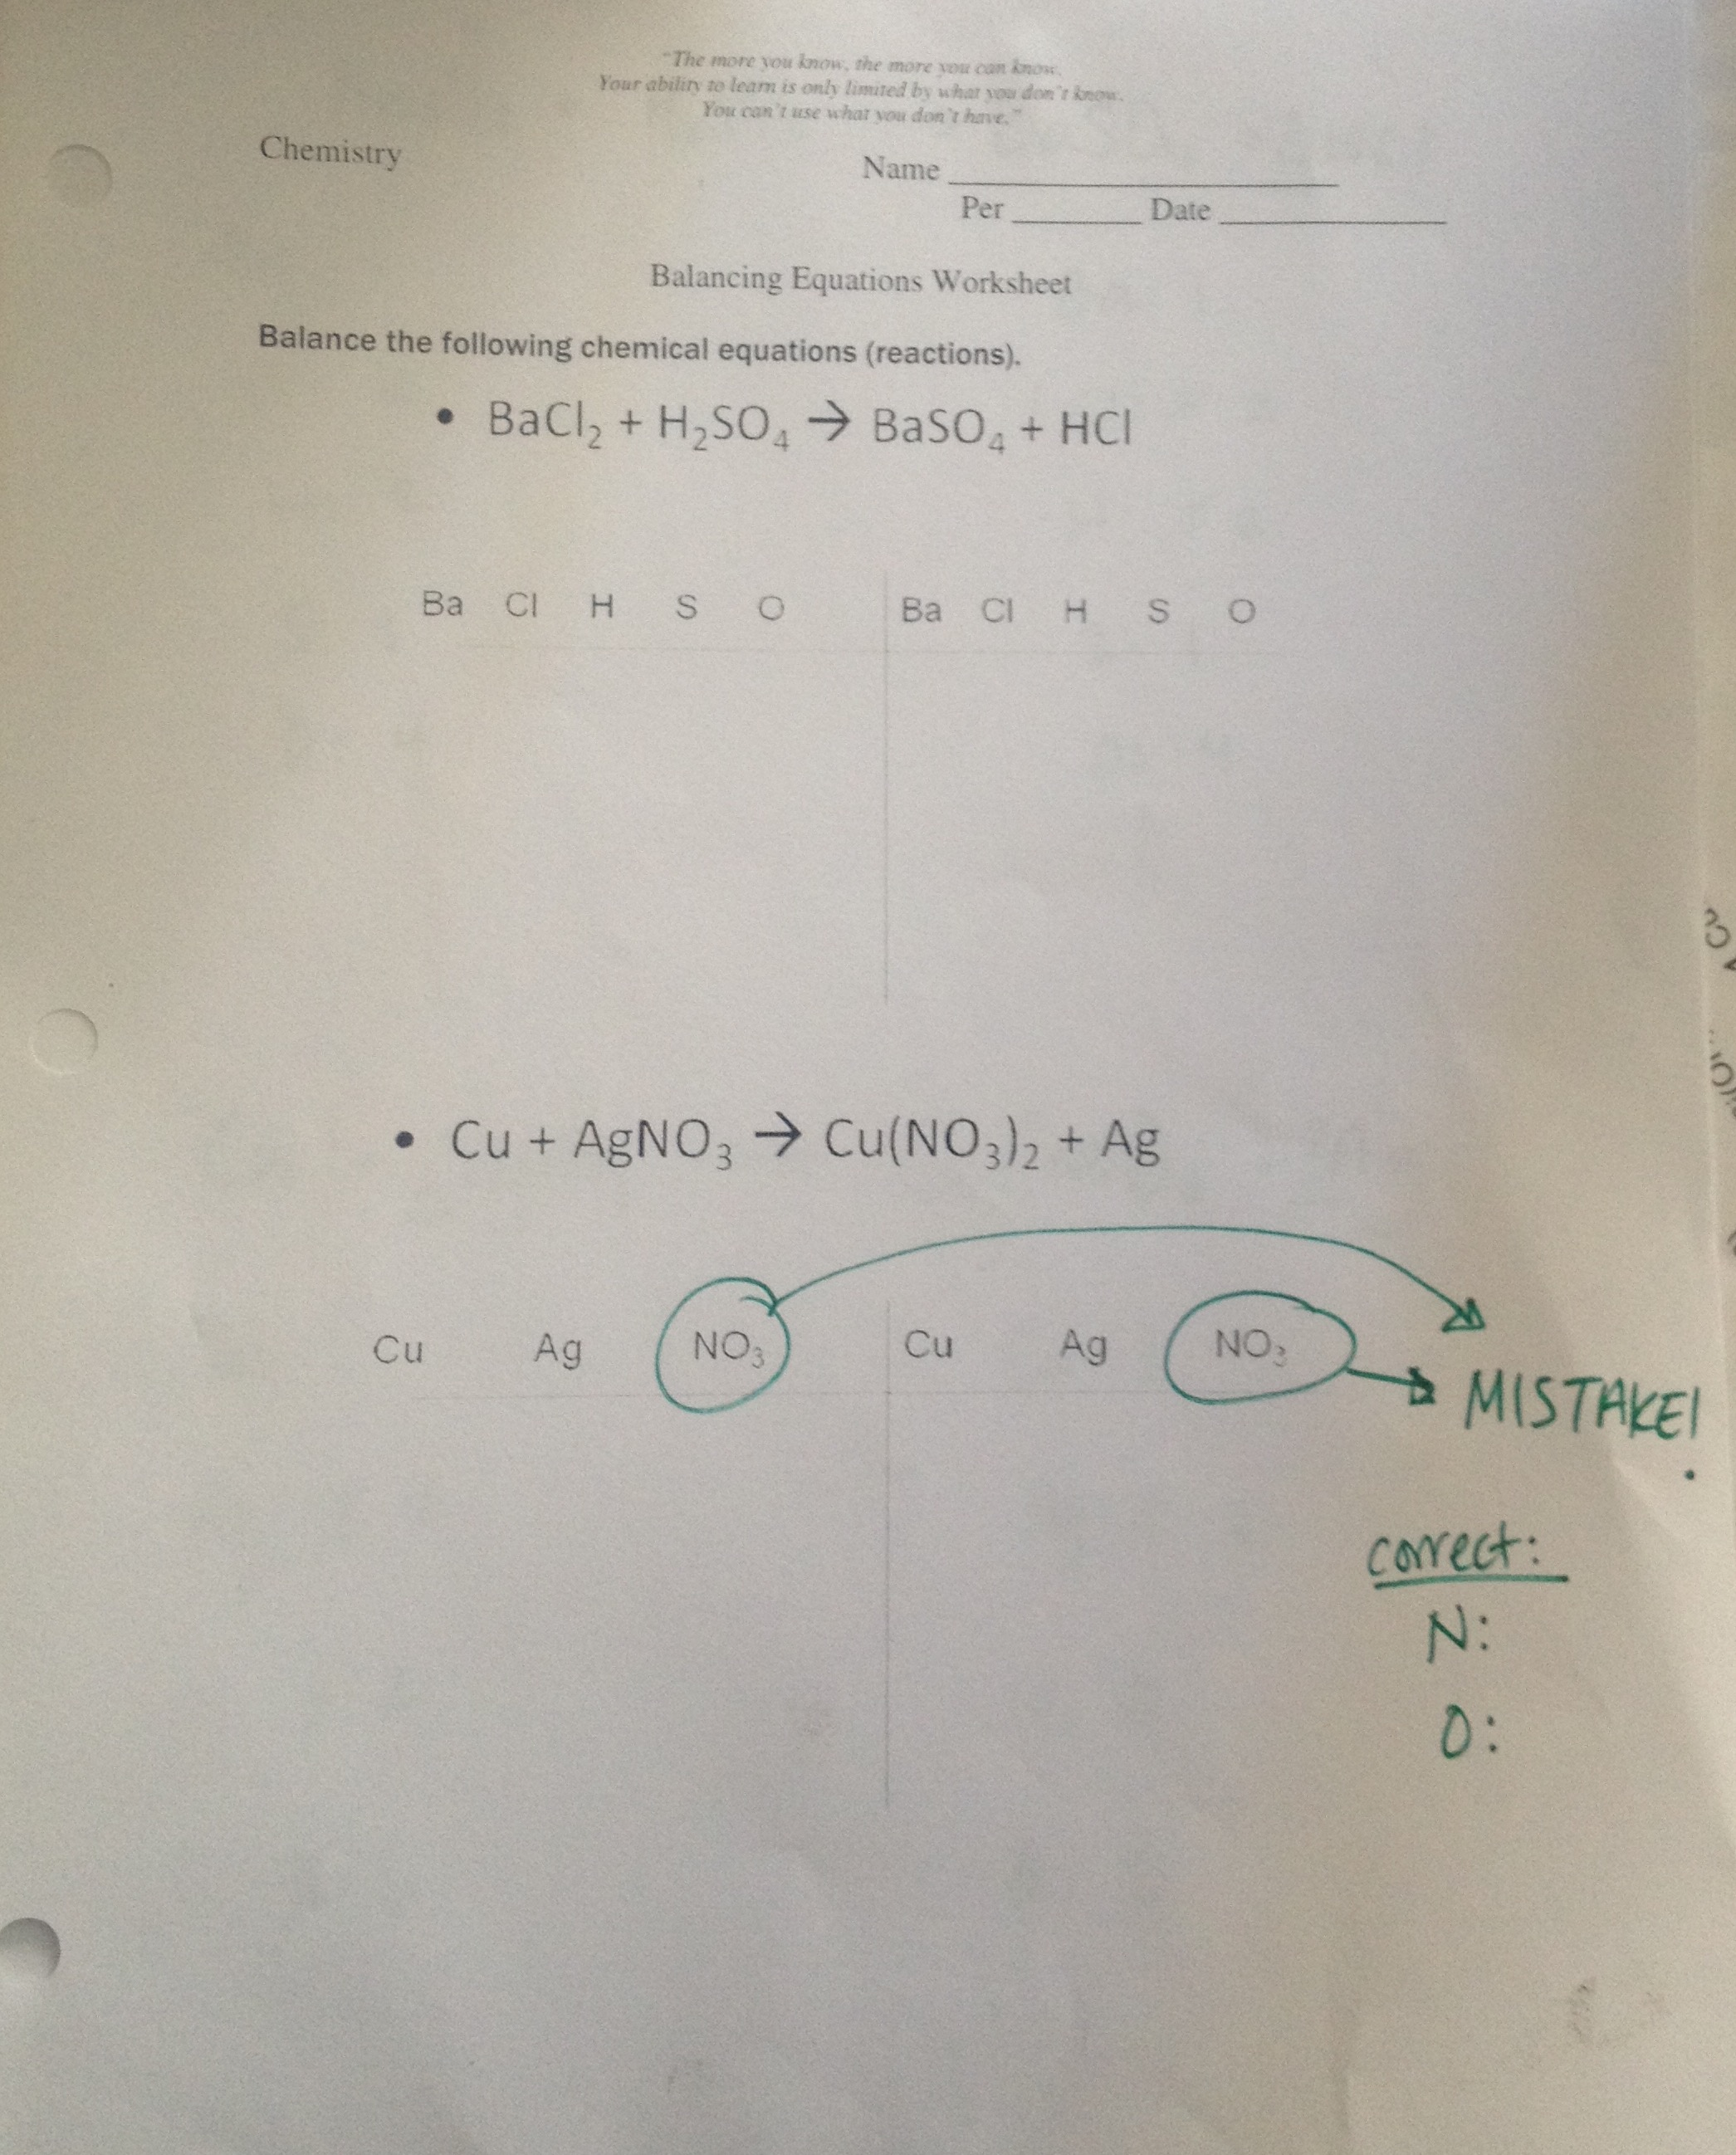 Momentum Impulse And Momentum Worksheet Answers